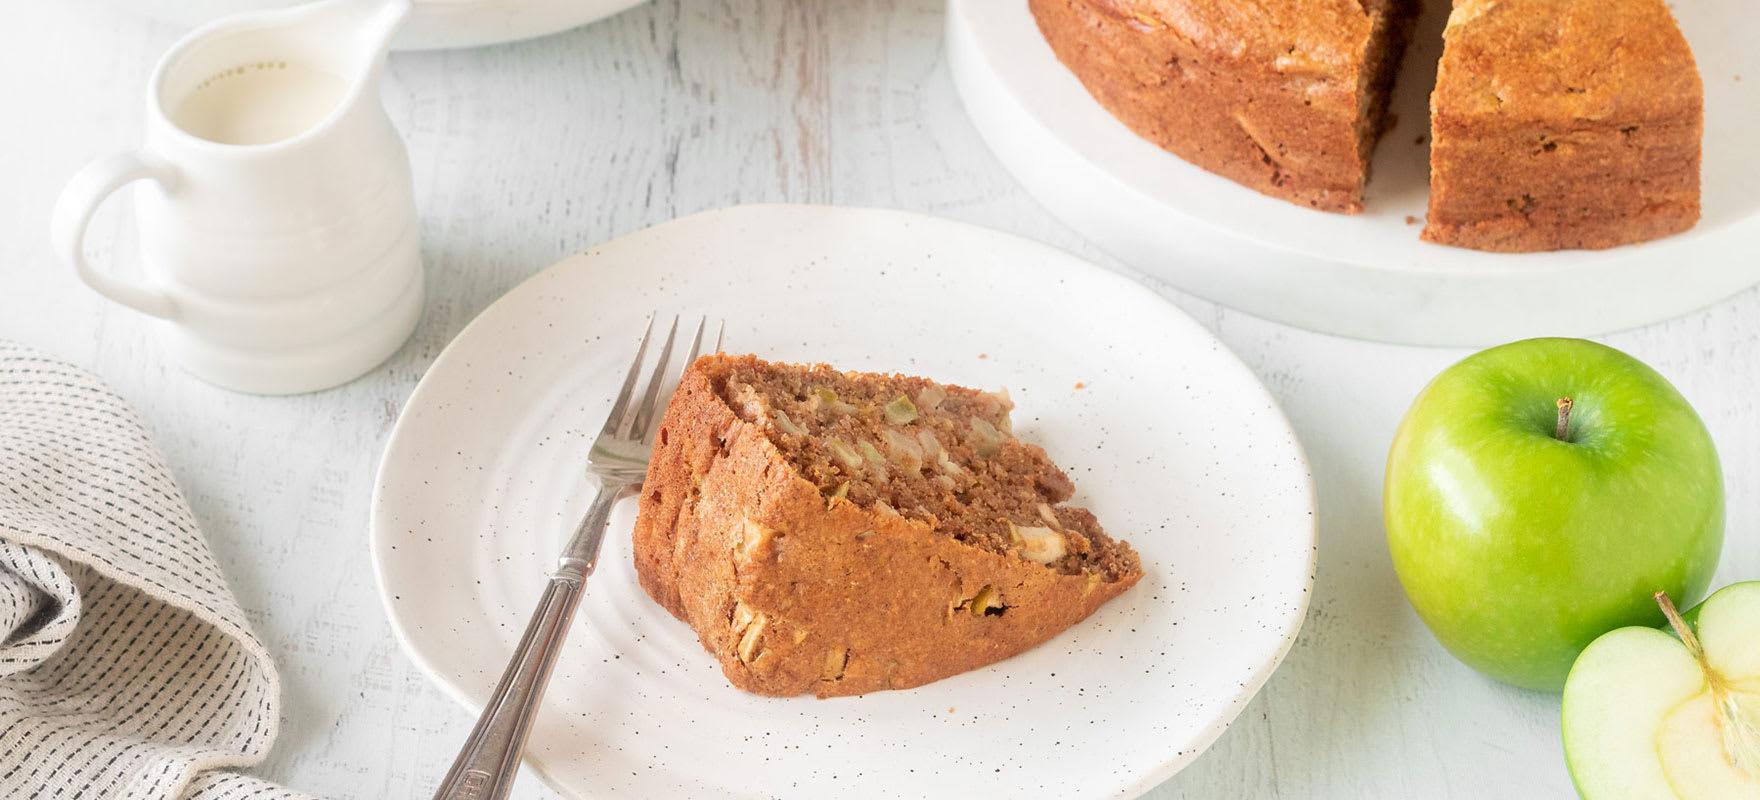 Spiced apple cake image 2